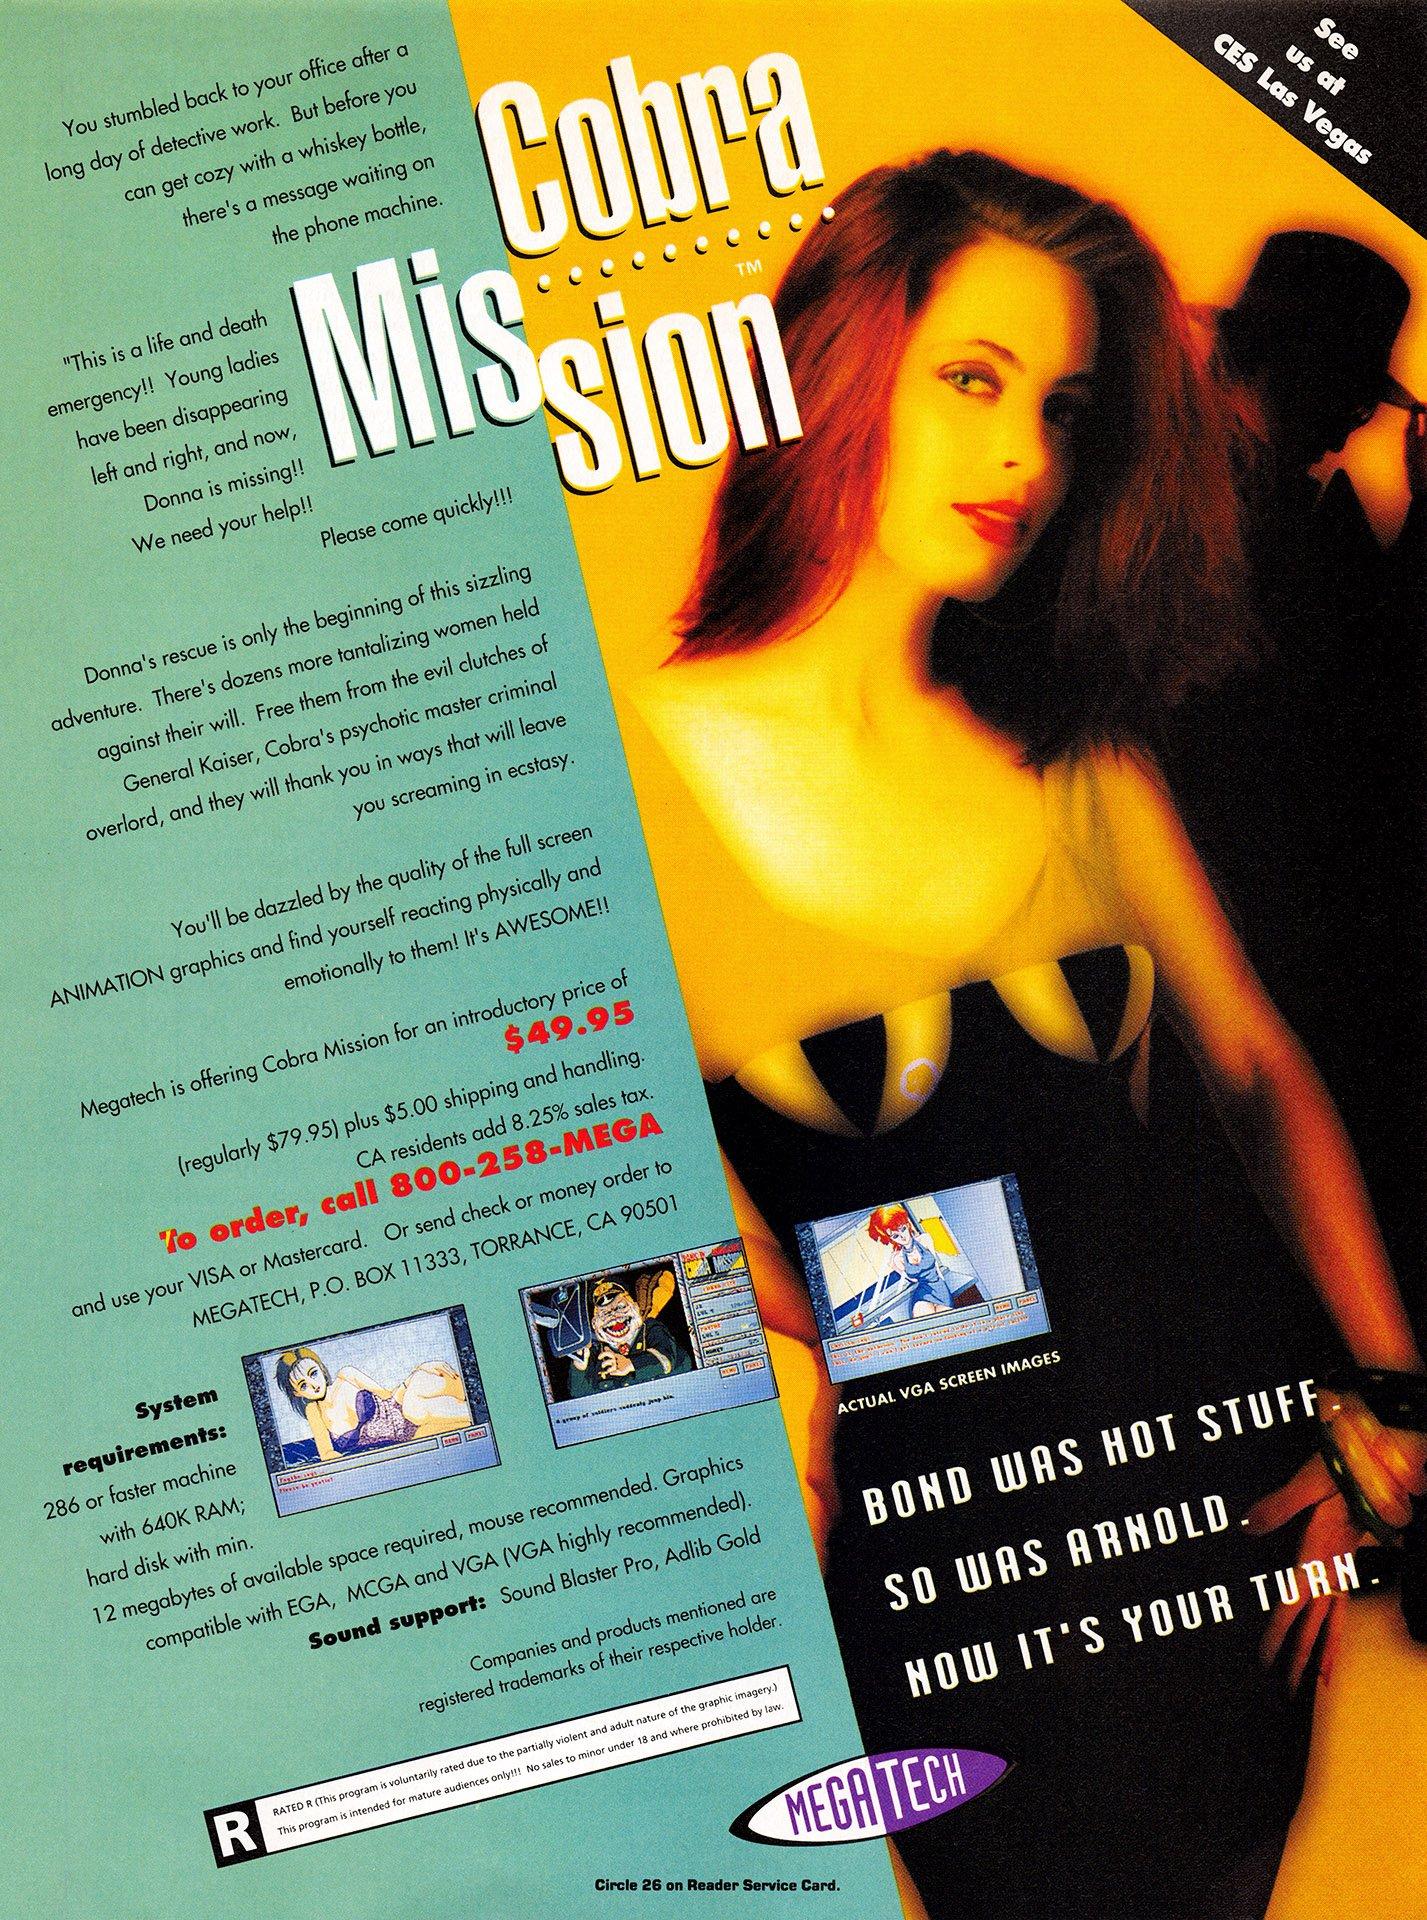 Cobra Mission (ver. 2)